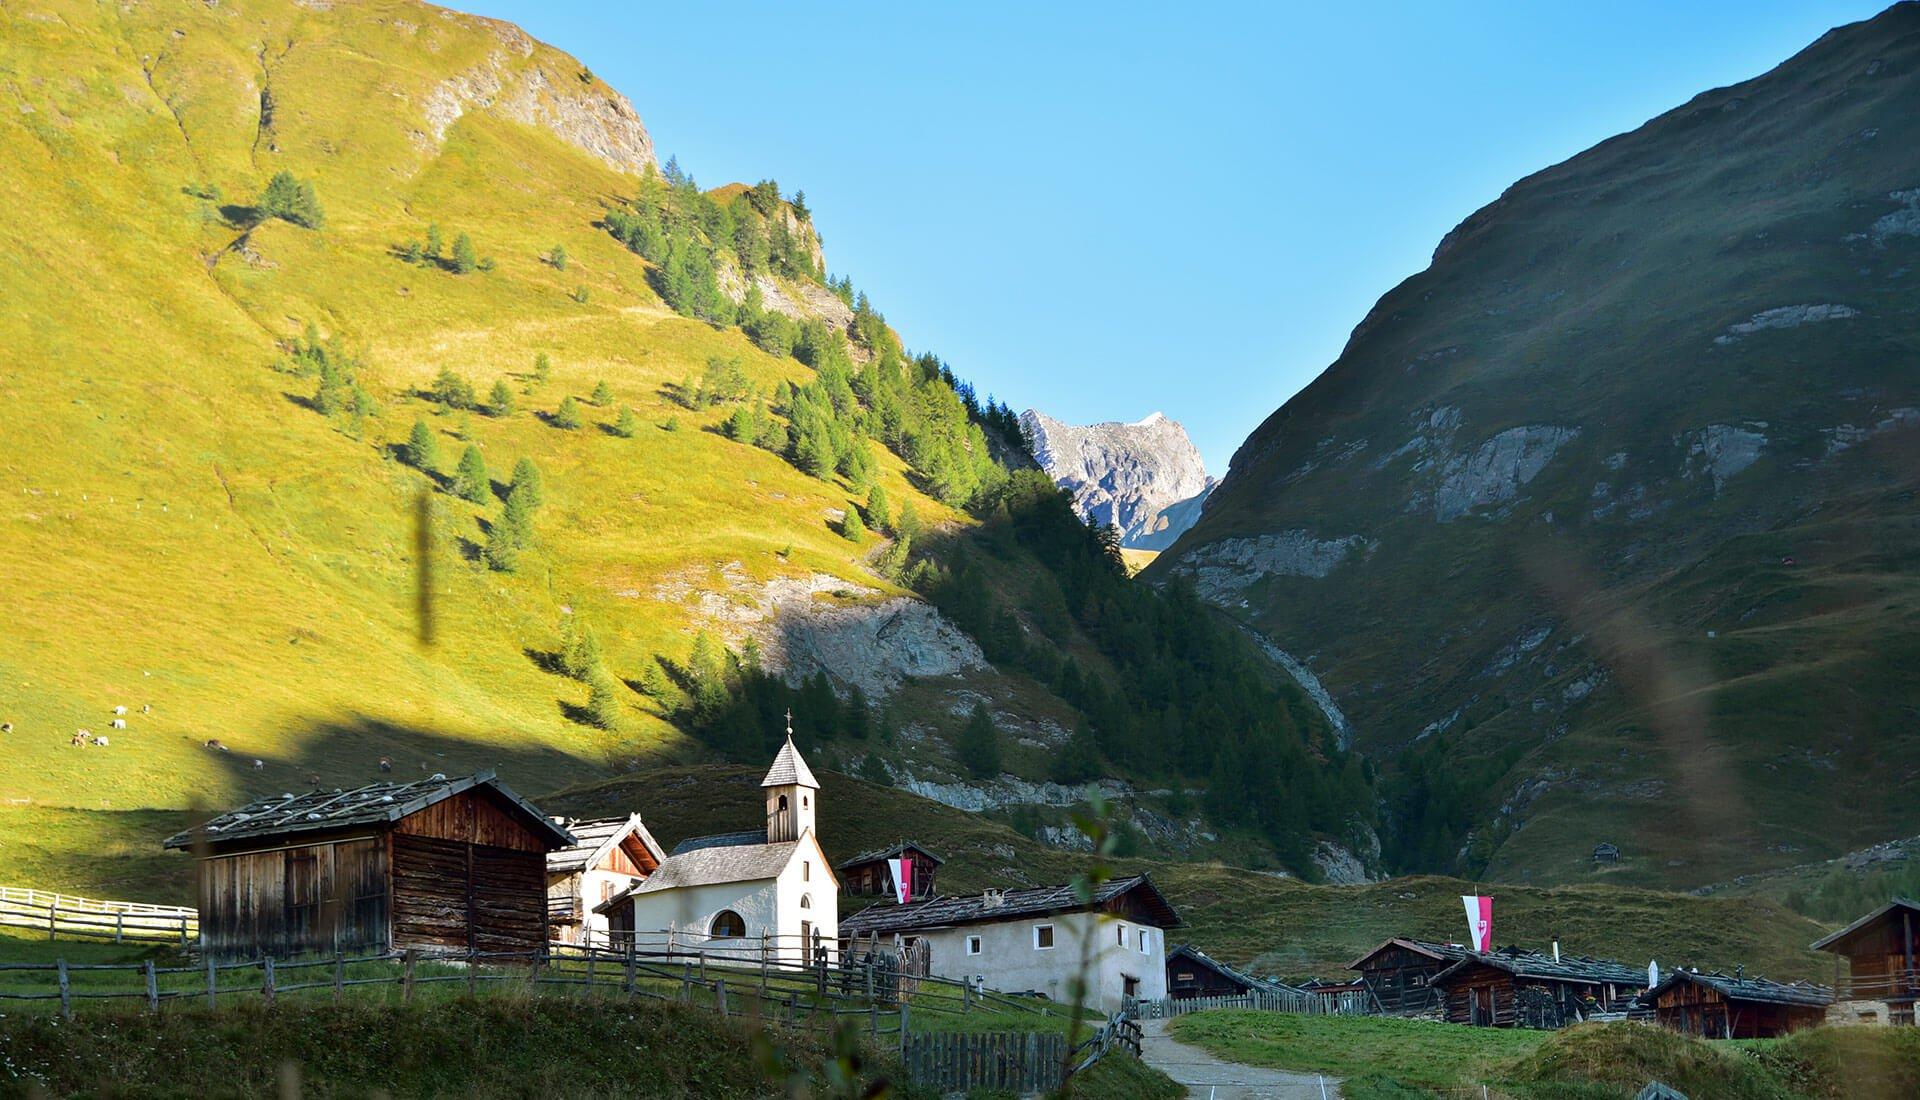 alpenchalet ferienregion gitschberg jochtal